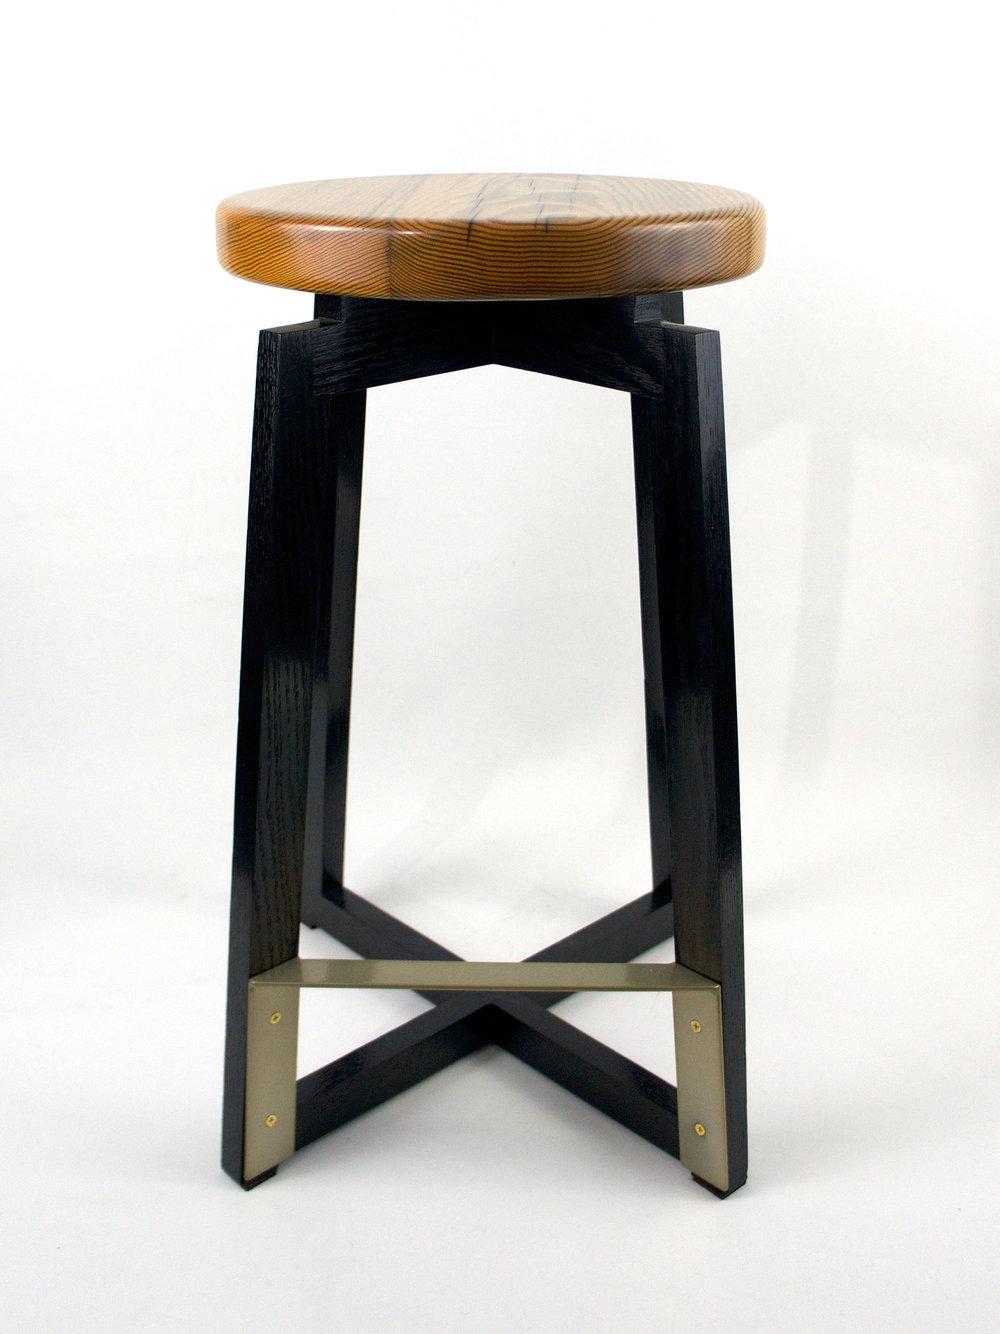 Picke wood stool 1.jpg